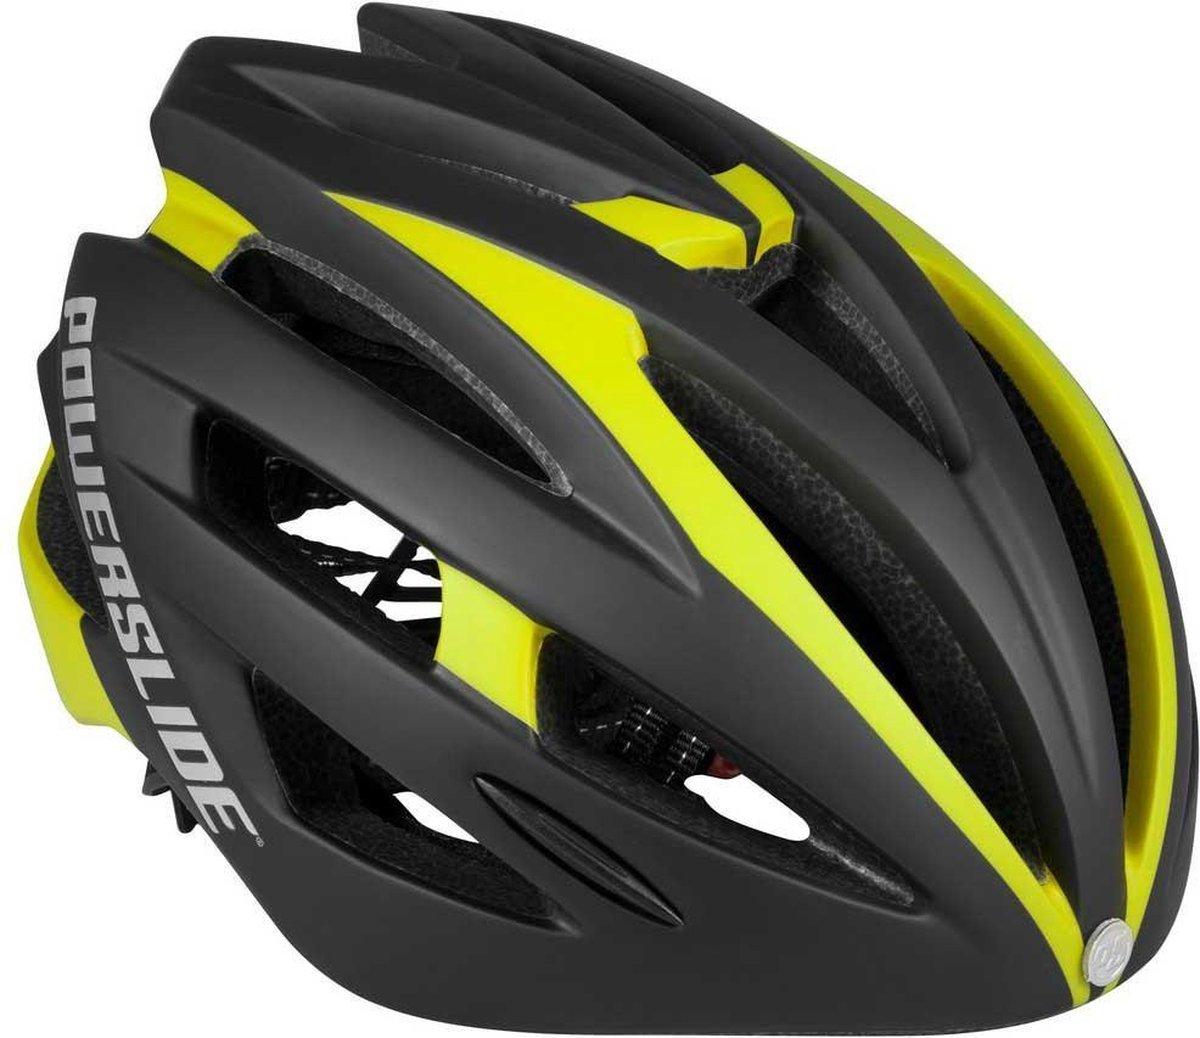 Powerslide Race Attack Helmet